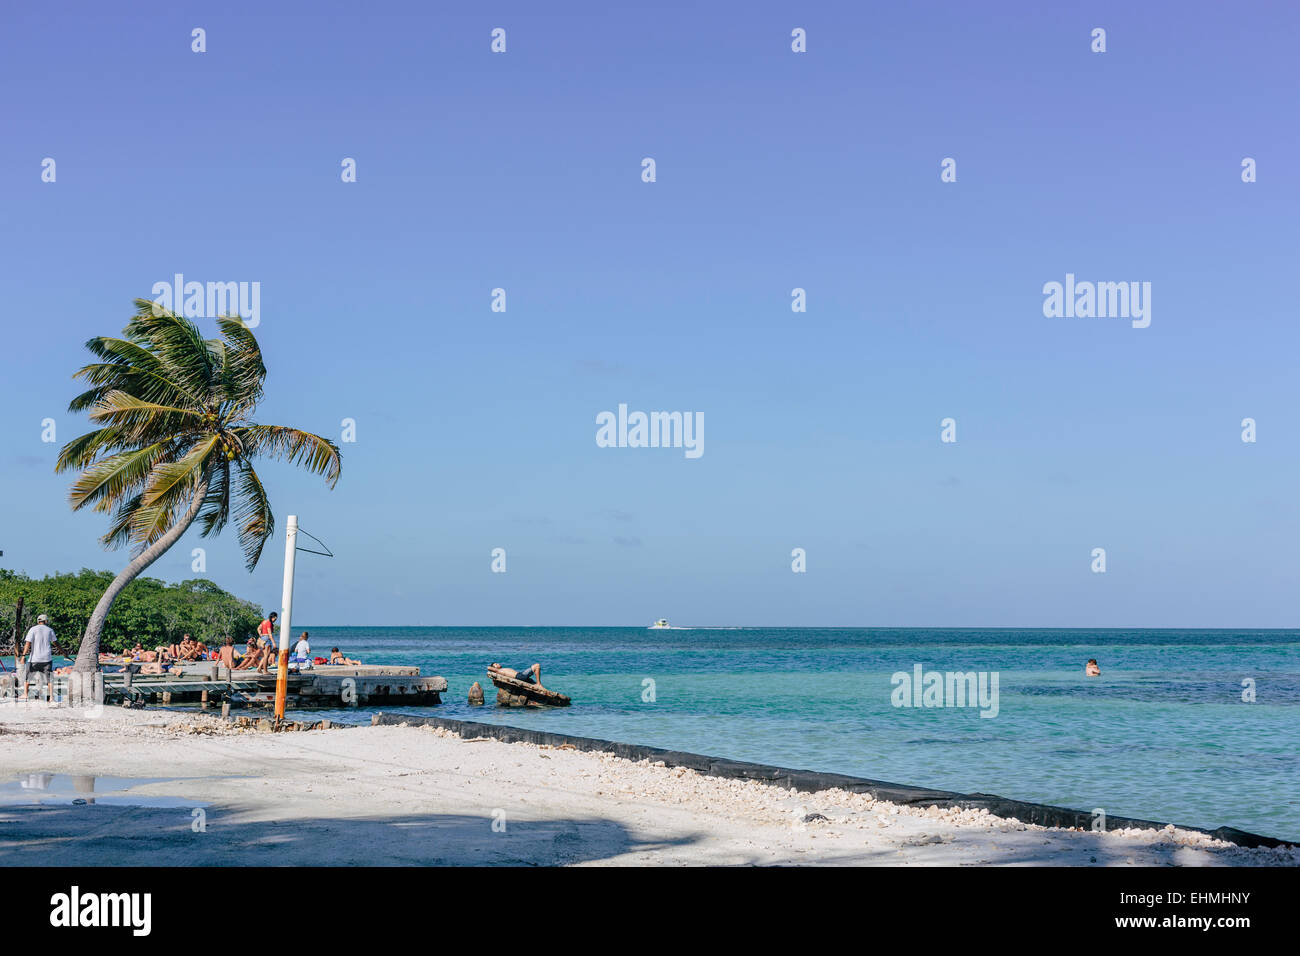 Sunbathers at The Split, Caye Caulker - Stock Image